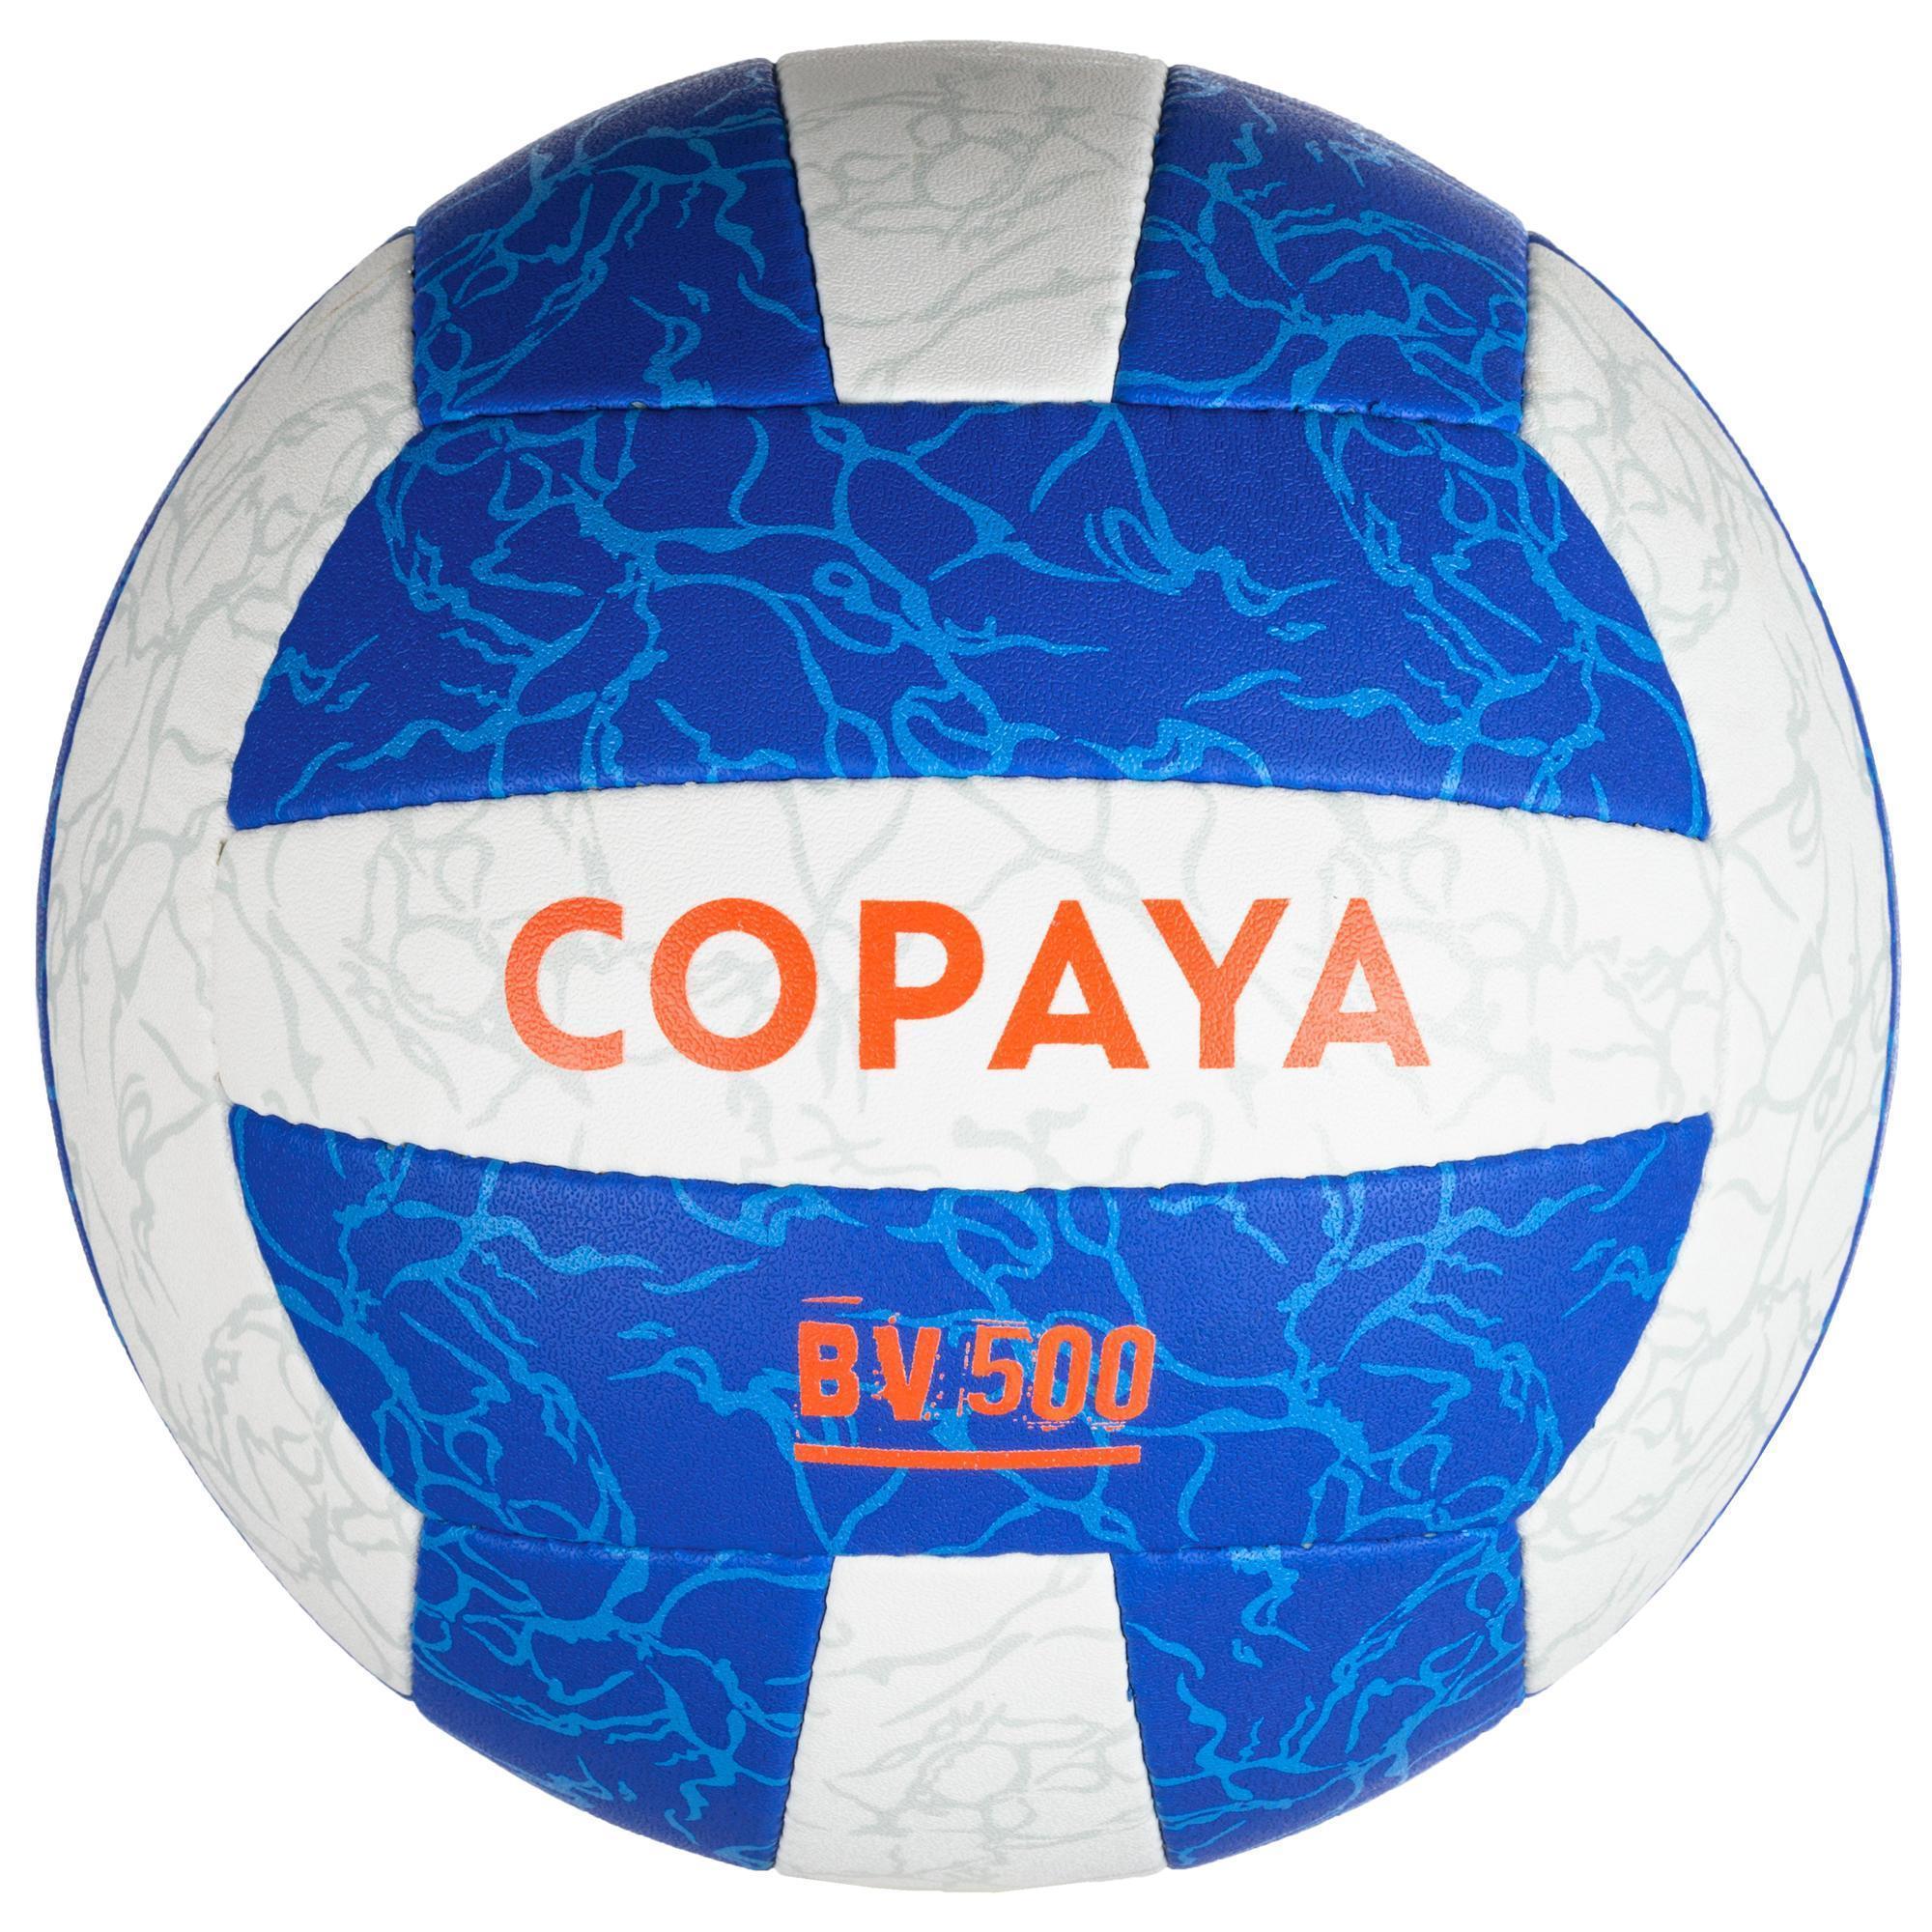 78a82000ff941 Ballon de beach-volley BV500 blanc et bleu - Clubs & Collectivités ...